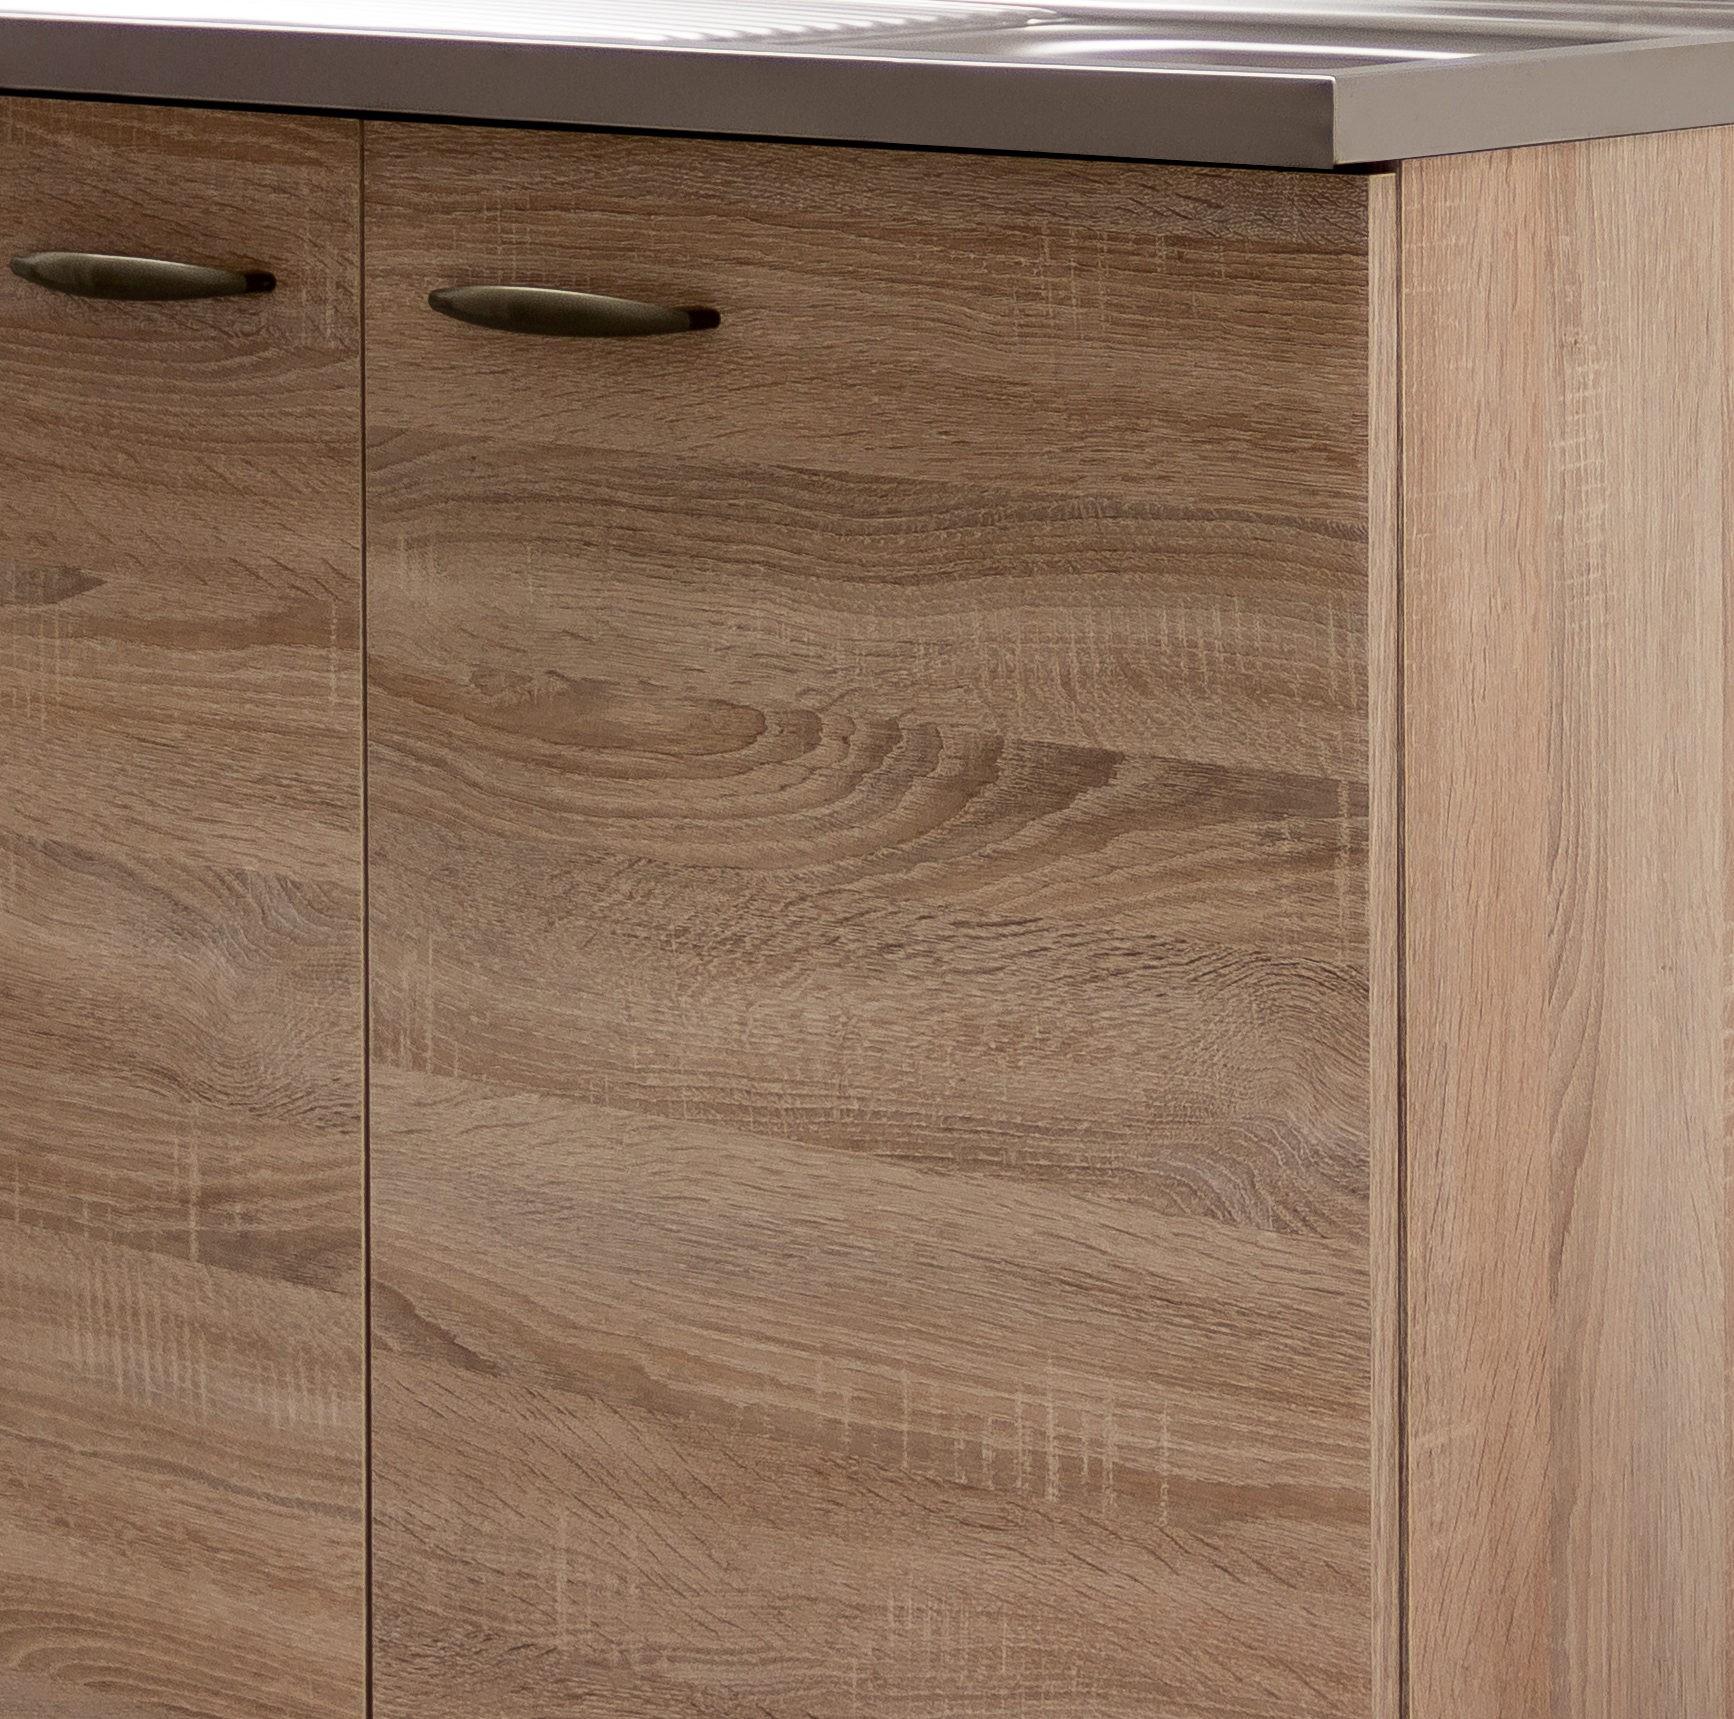 sp lenschrank herne k che sp le sp lschrank 100 cm breit 50 cm tief eiche sonoma ebay. Black Bedroom Furniture Sets. Home Design Ideas